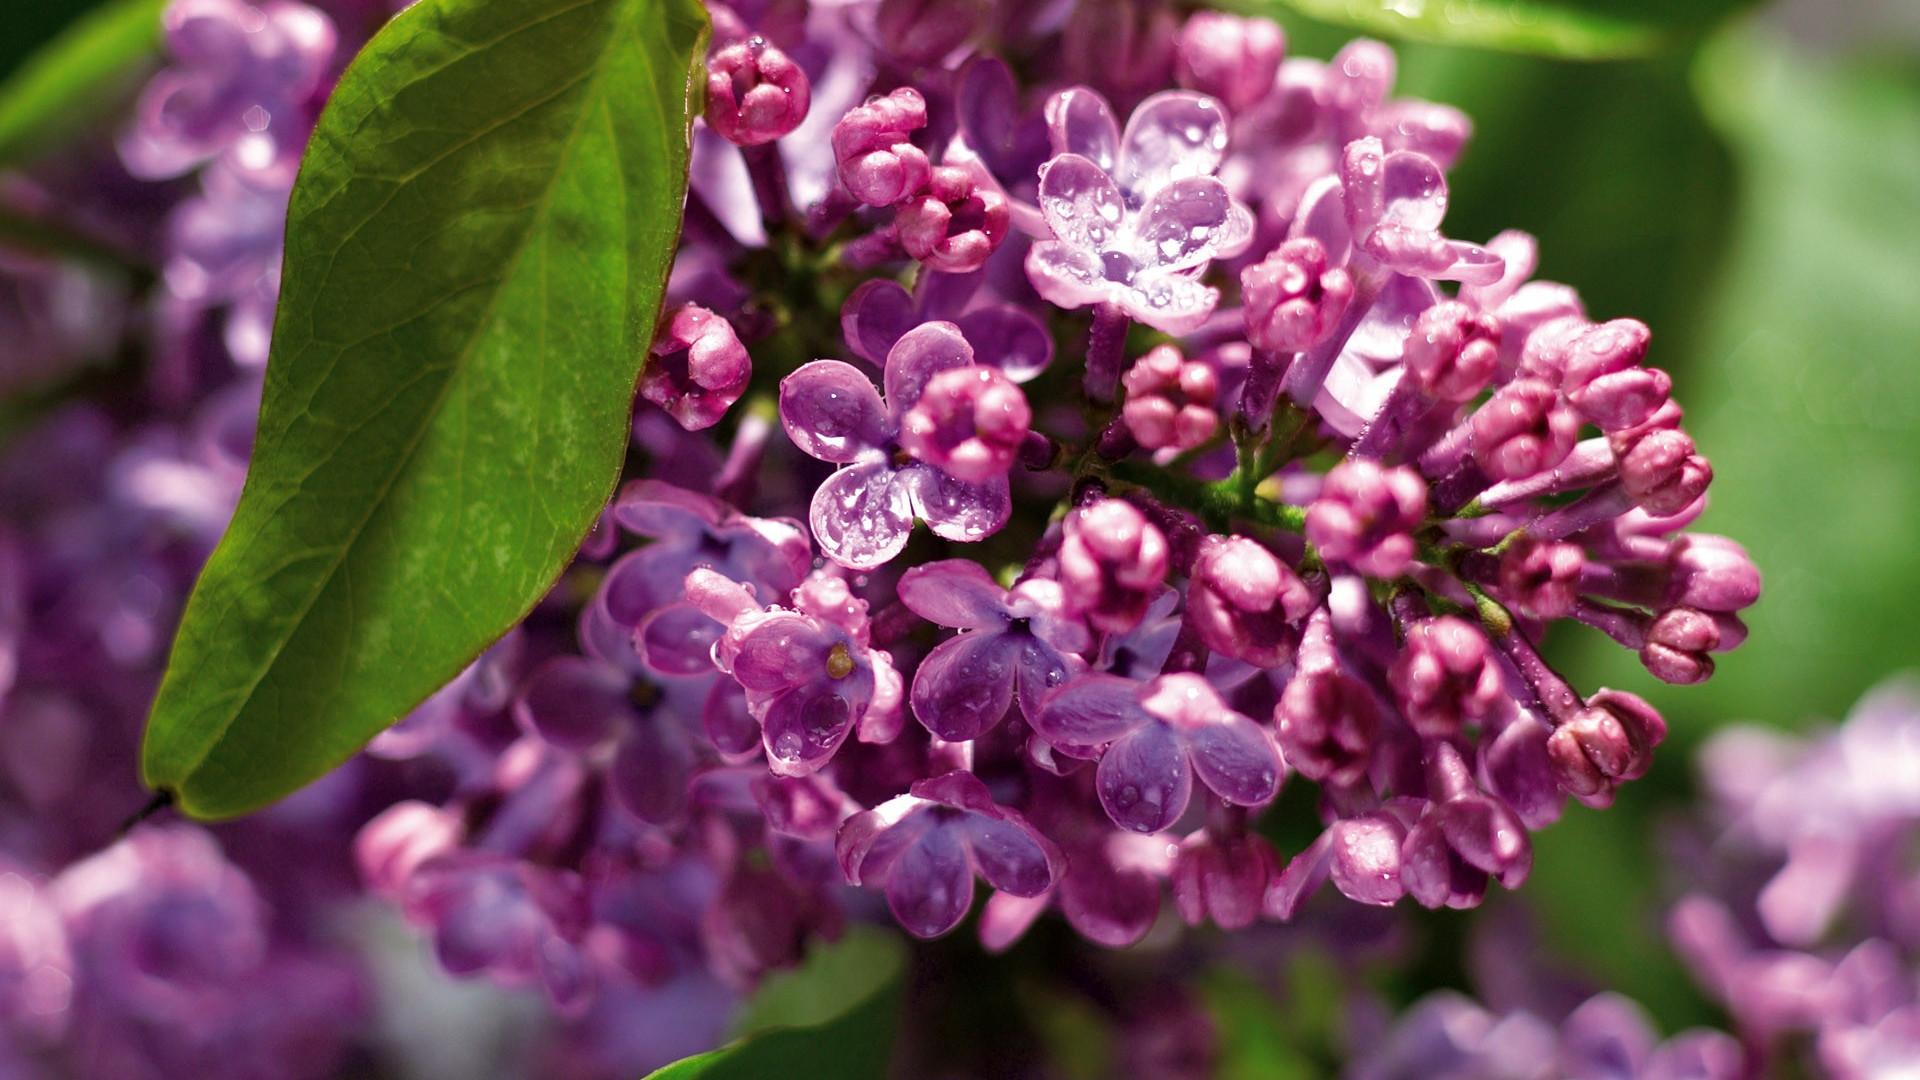 Lilac Background Wallpaper - WallpaperSafari